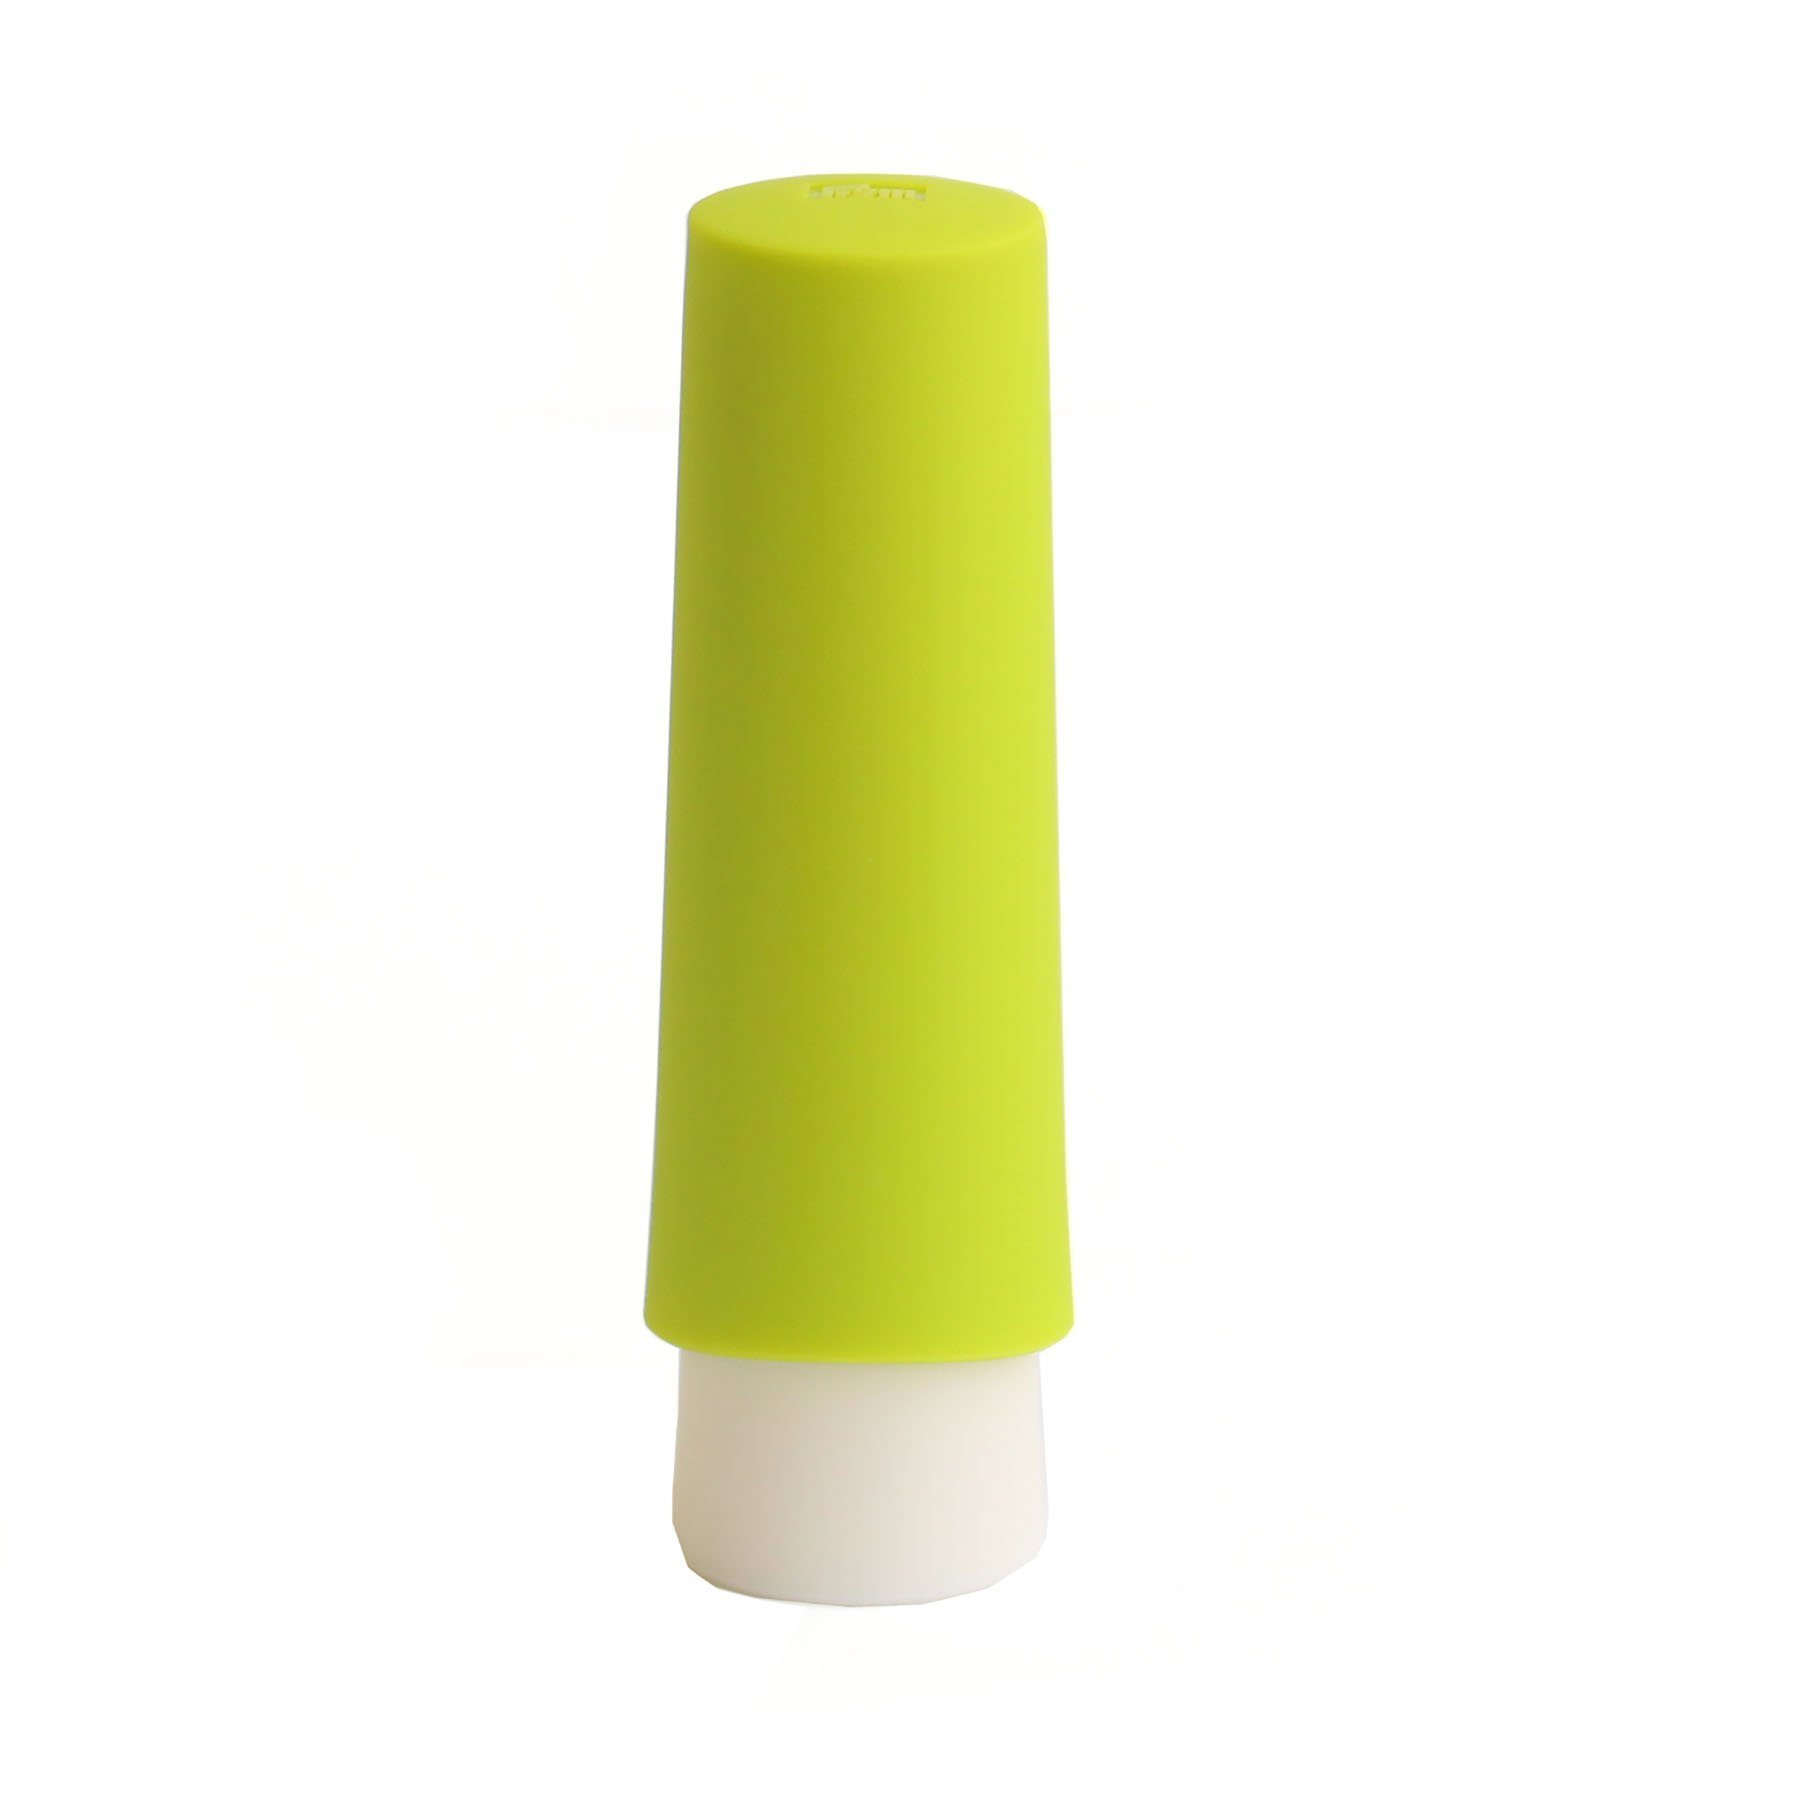 Prym Recambio para bolígrafo de Guarda Agujas Giratorio. Verde product image